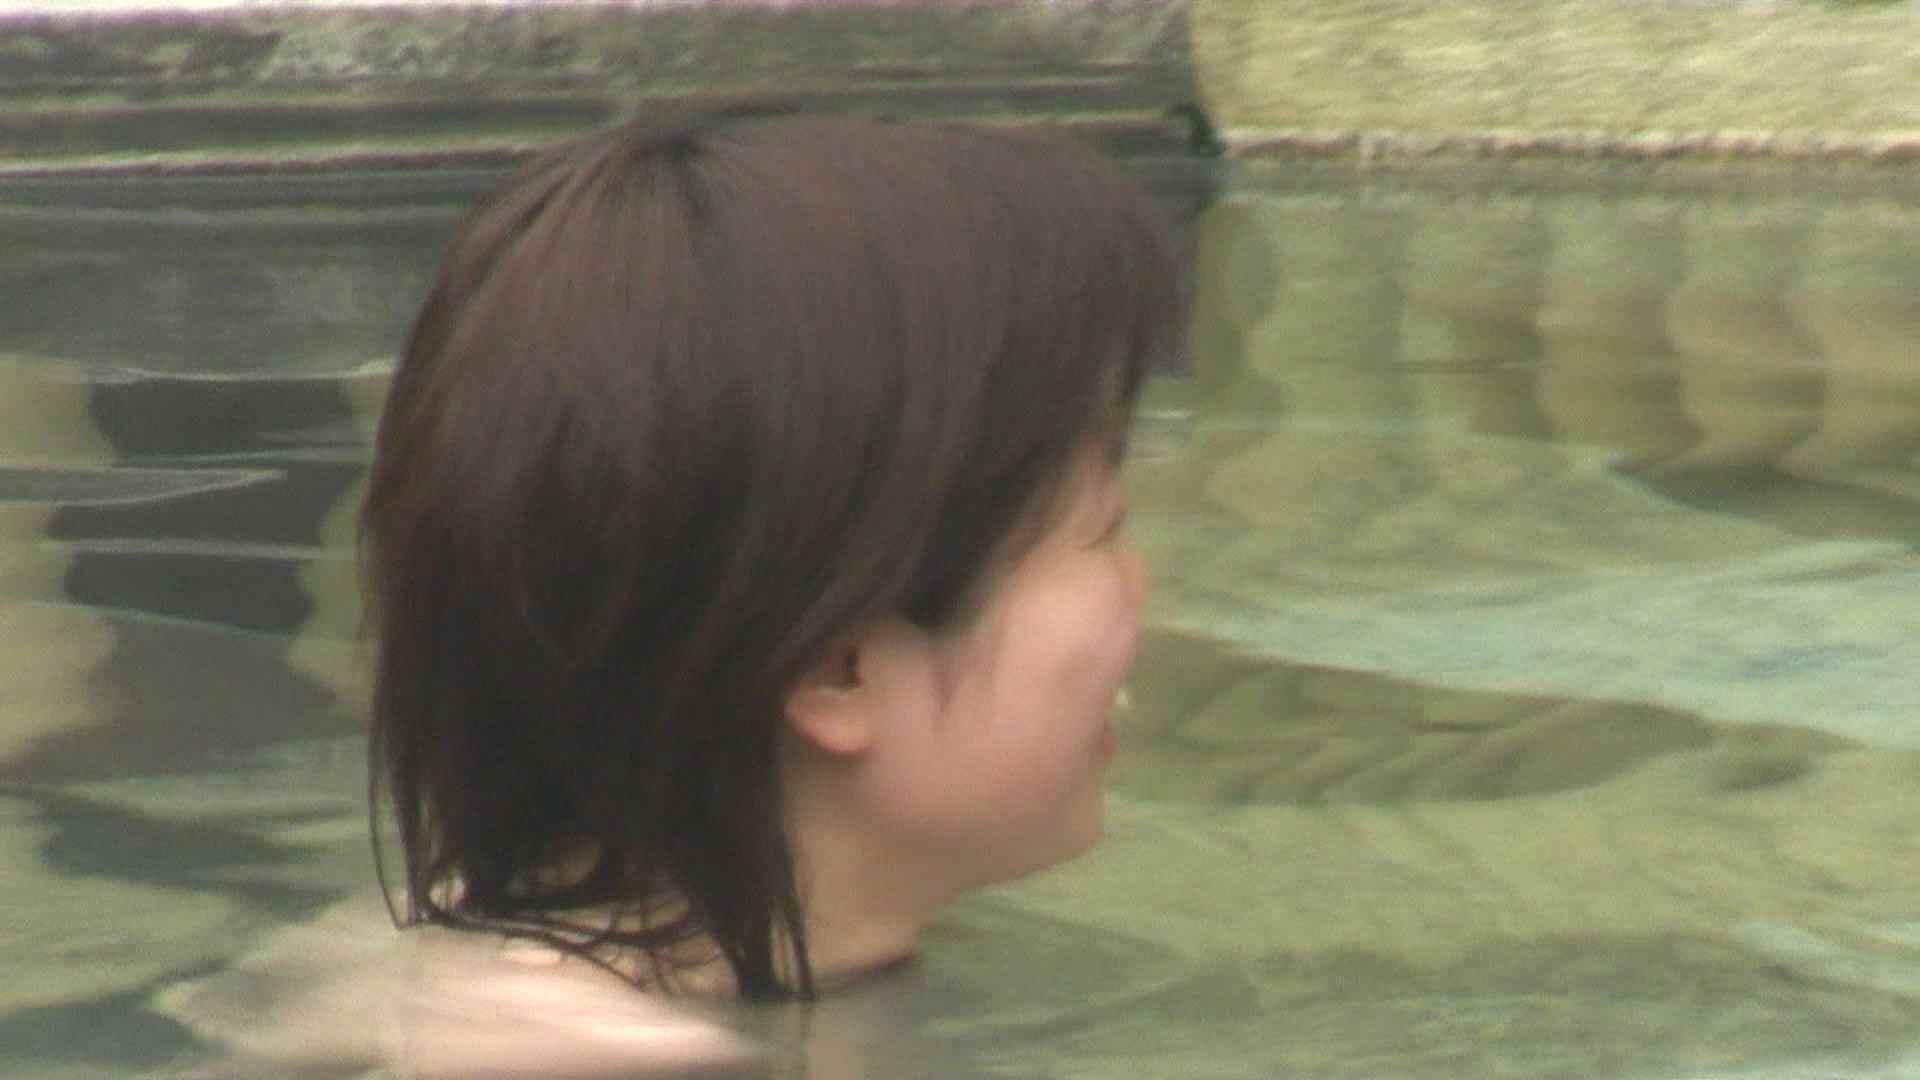 Aquaな露天風呂Vol.675 露天風呂編  91PIX 34